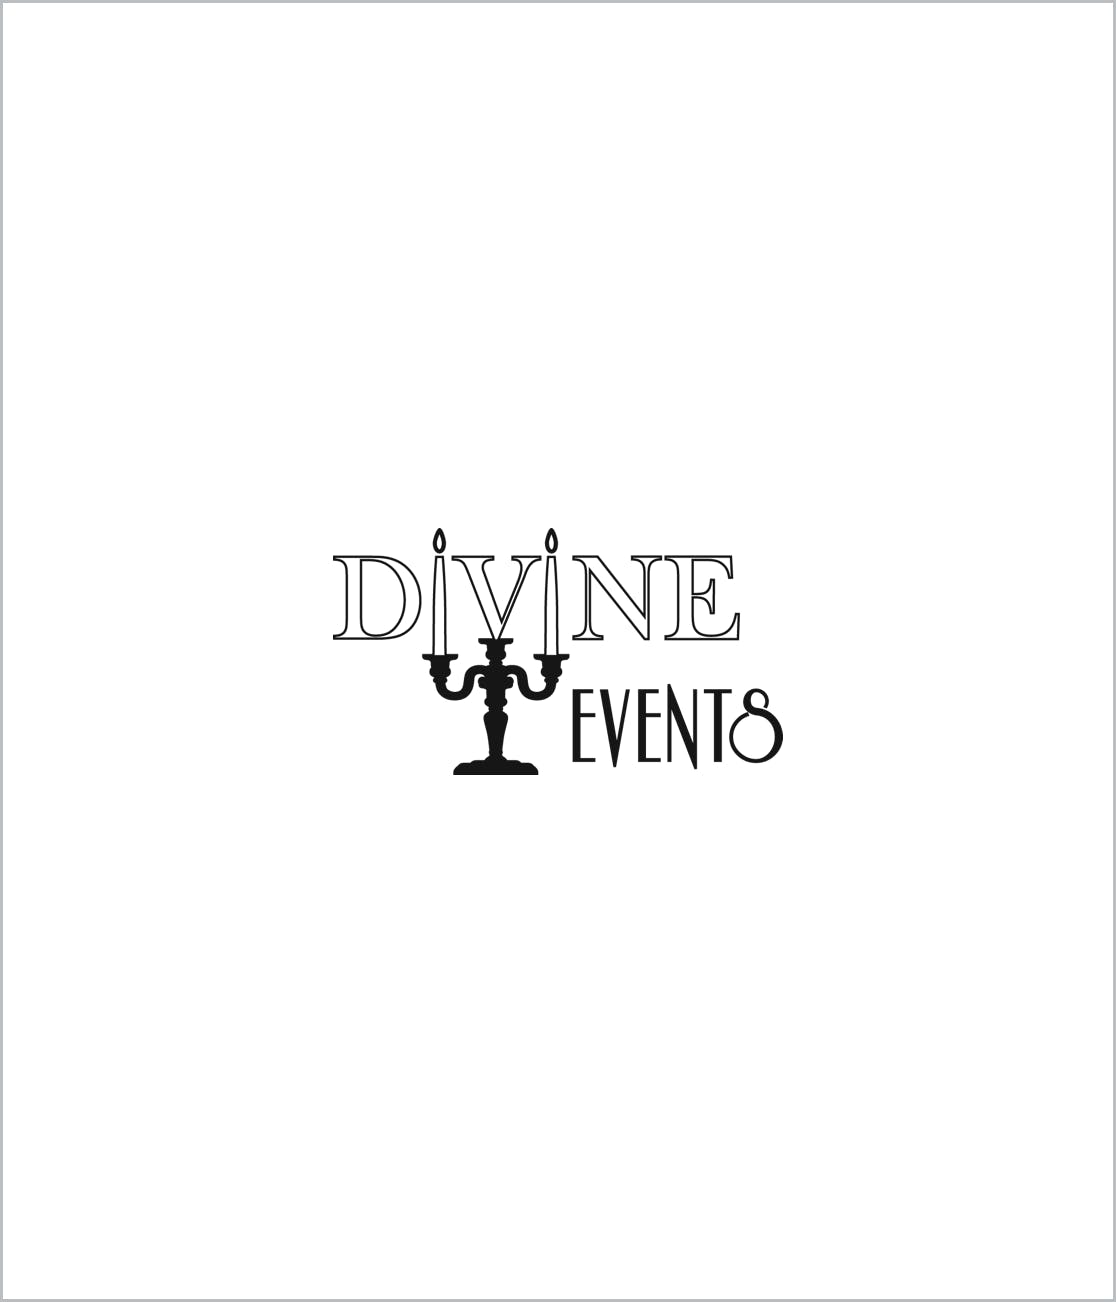 Divine Events Logo Supplier